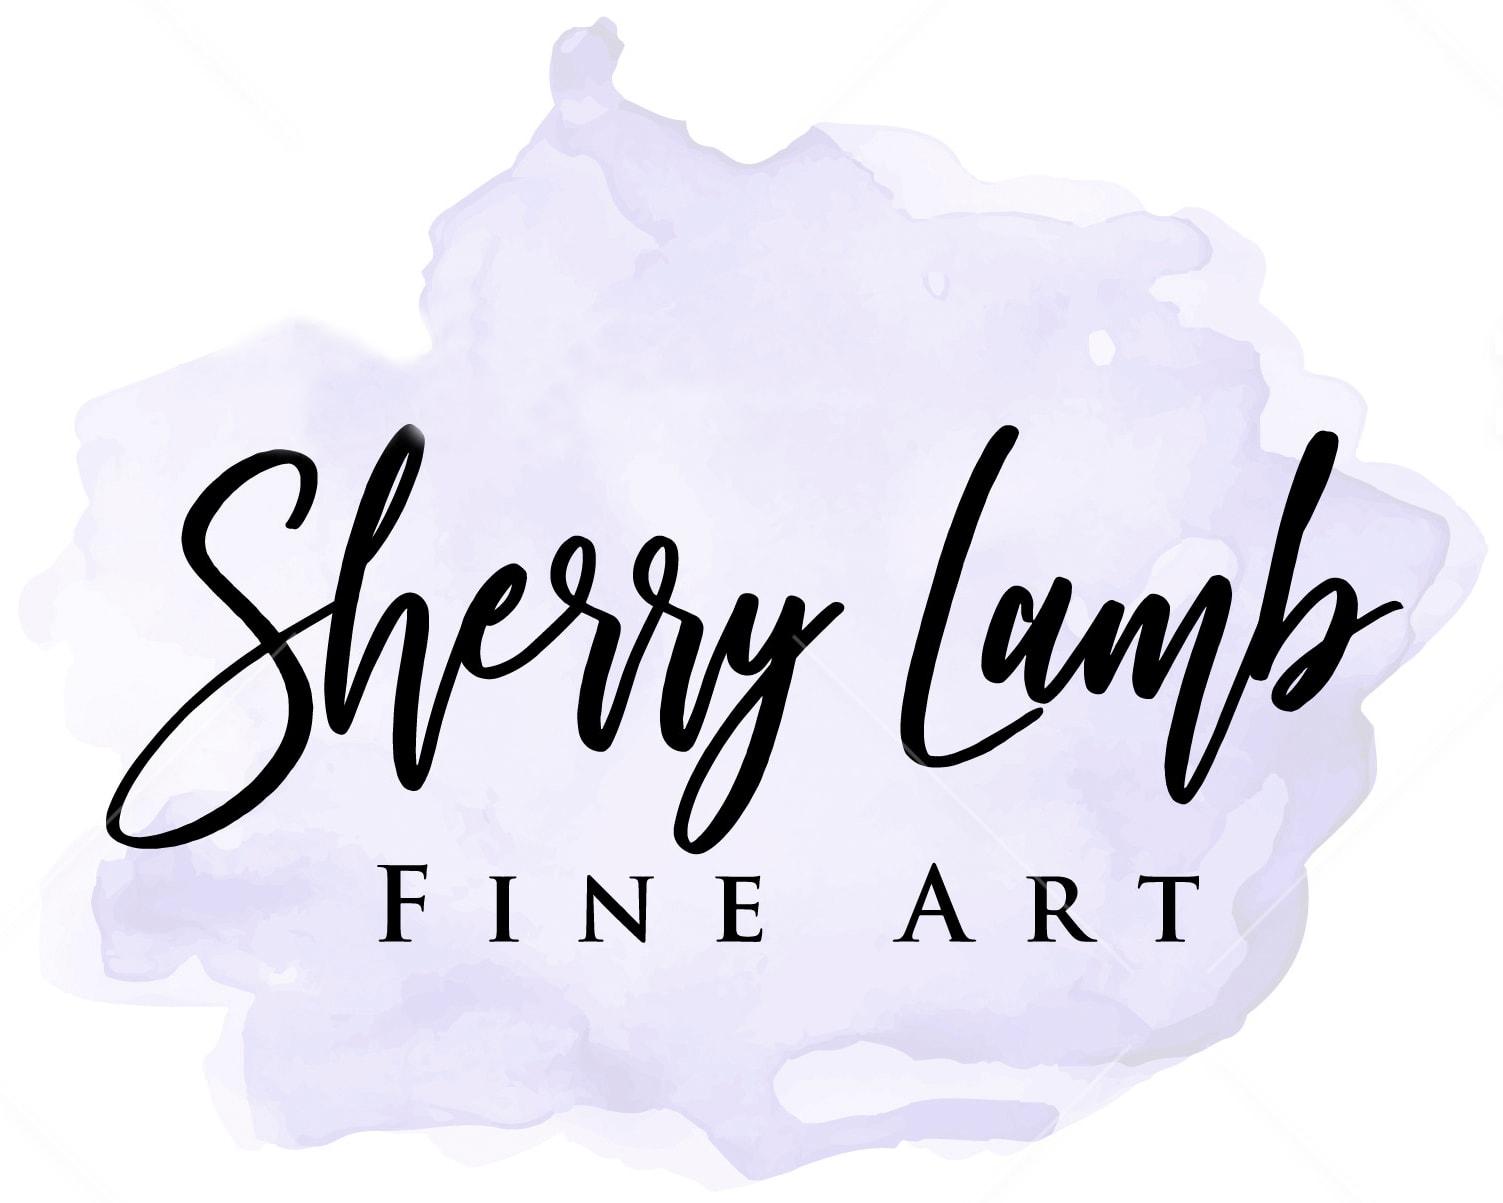 sherrylamb